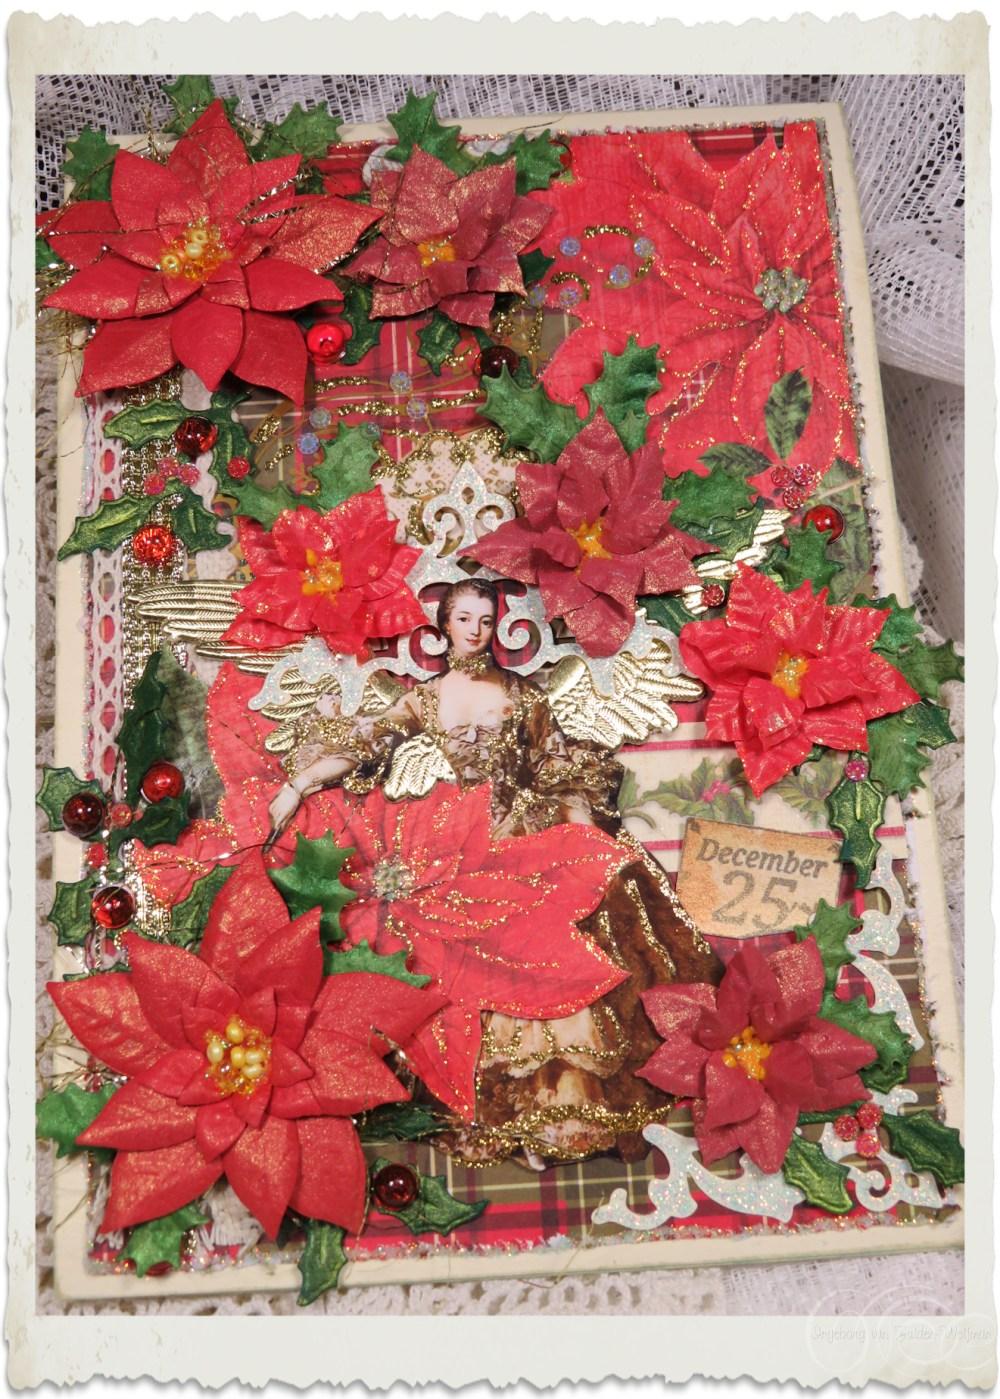 Handmade Christmas card with poinsettia by Ingeborg van Zuiden